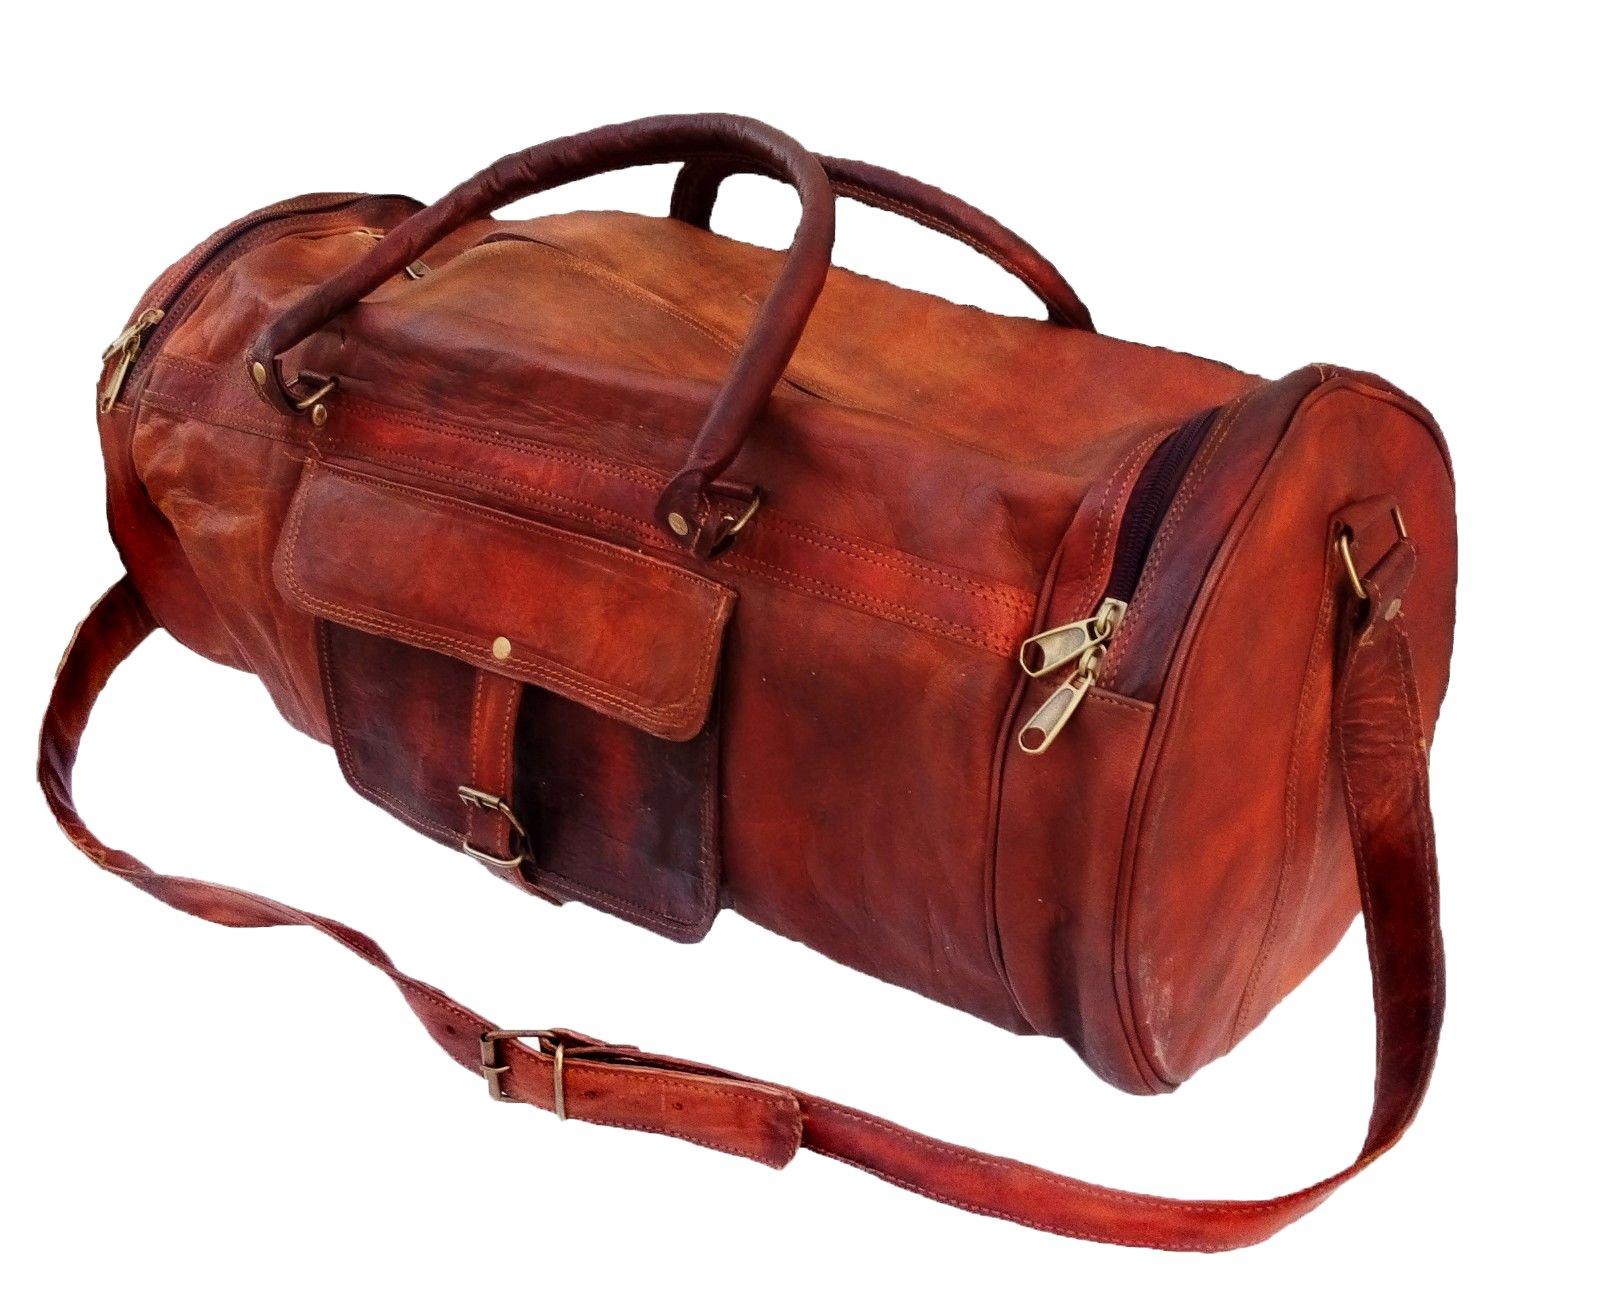 26'' Men's Genuine Leather Vintage Duffle Gym Large Travel Weekend Luggage Bag by jaald